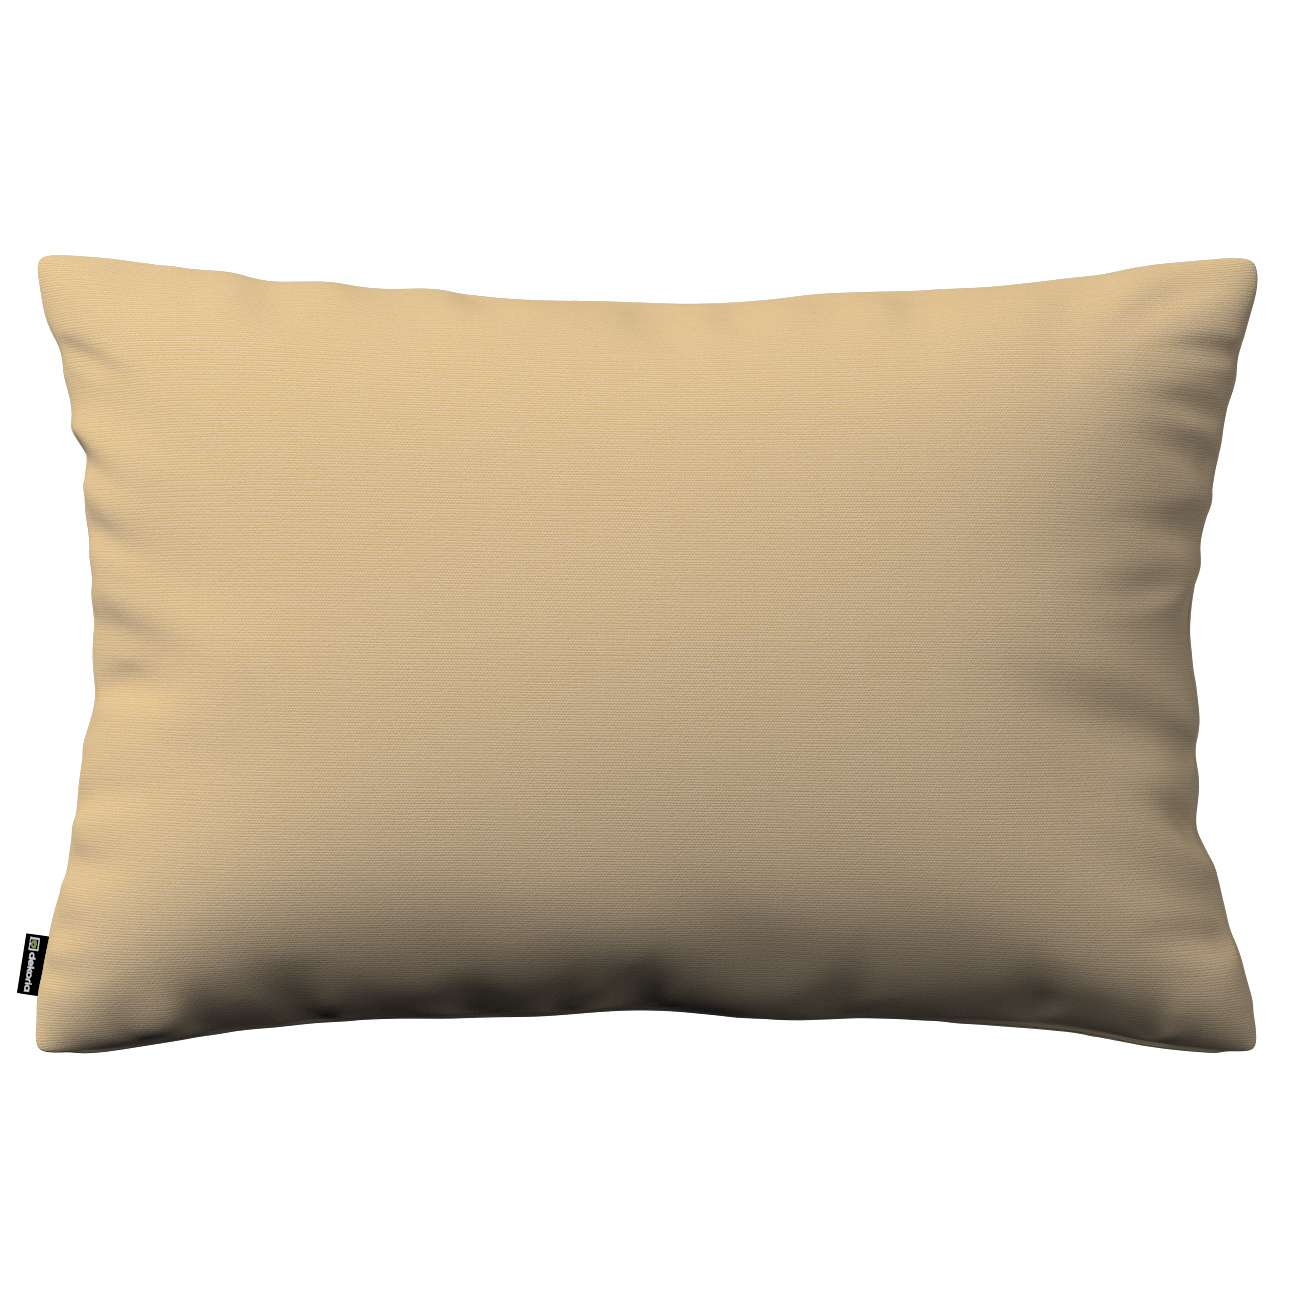 Kissenhülle Kinga 60x40cm 60x40cm von der Kollektion Cotton Panama, Stoff: 702-01